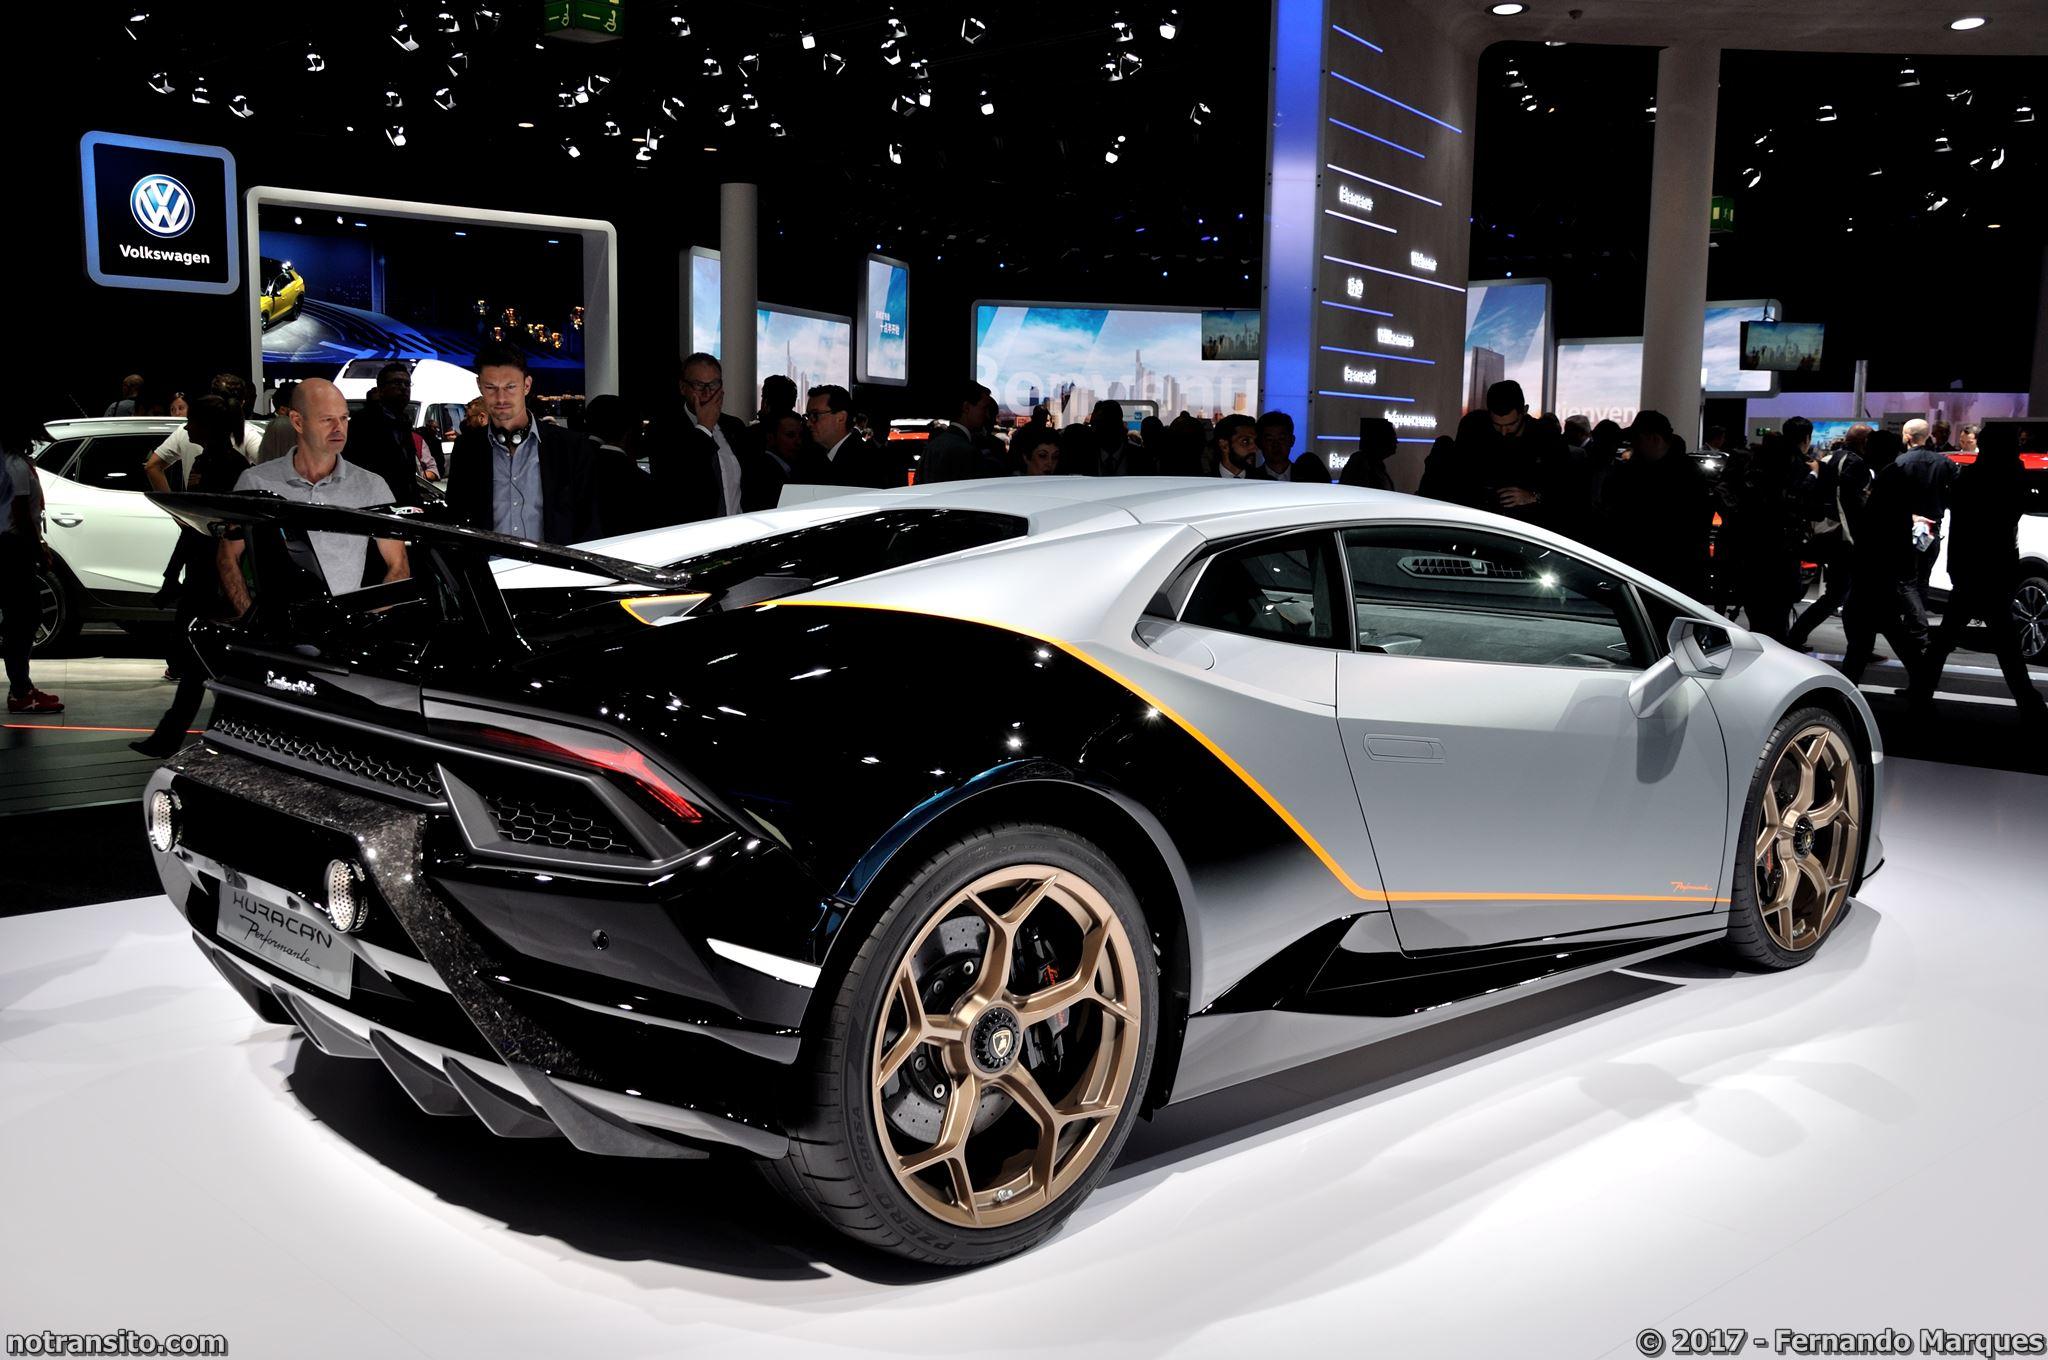 Lamborghini-Huracan-Performante-Frankfurt-2017-010